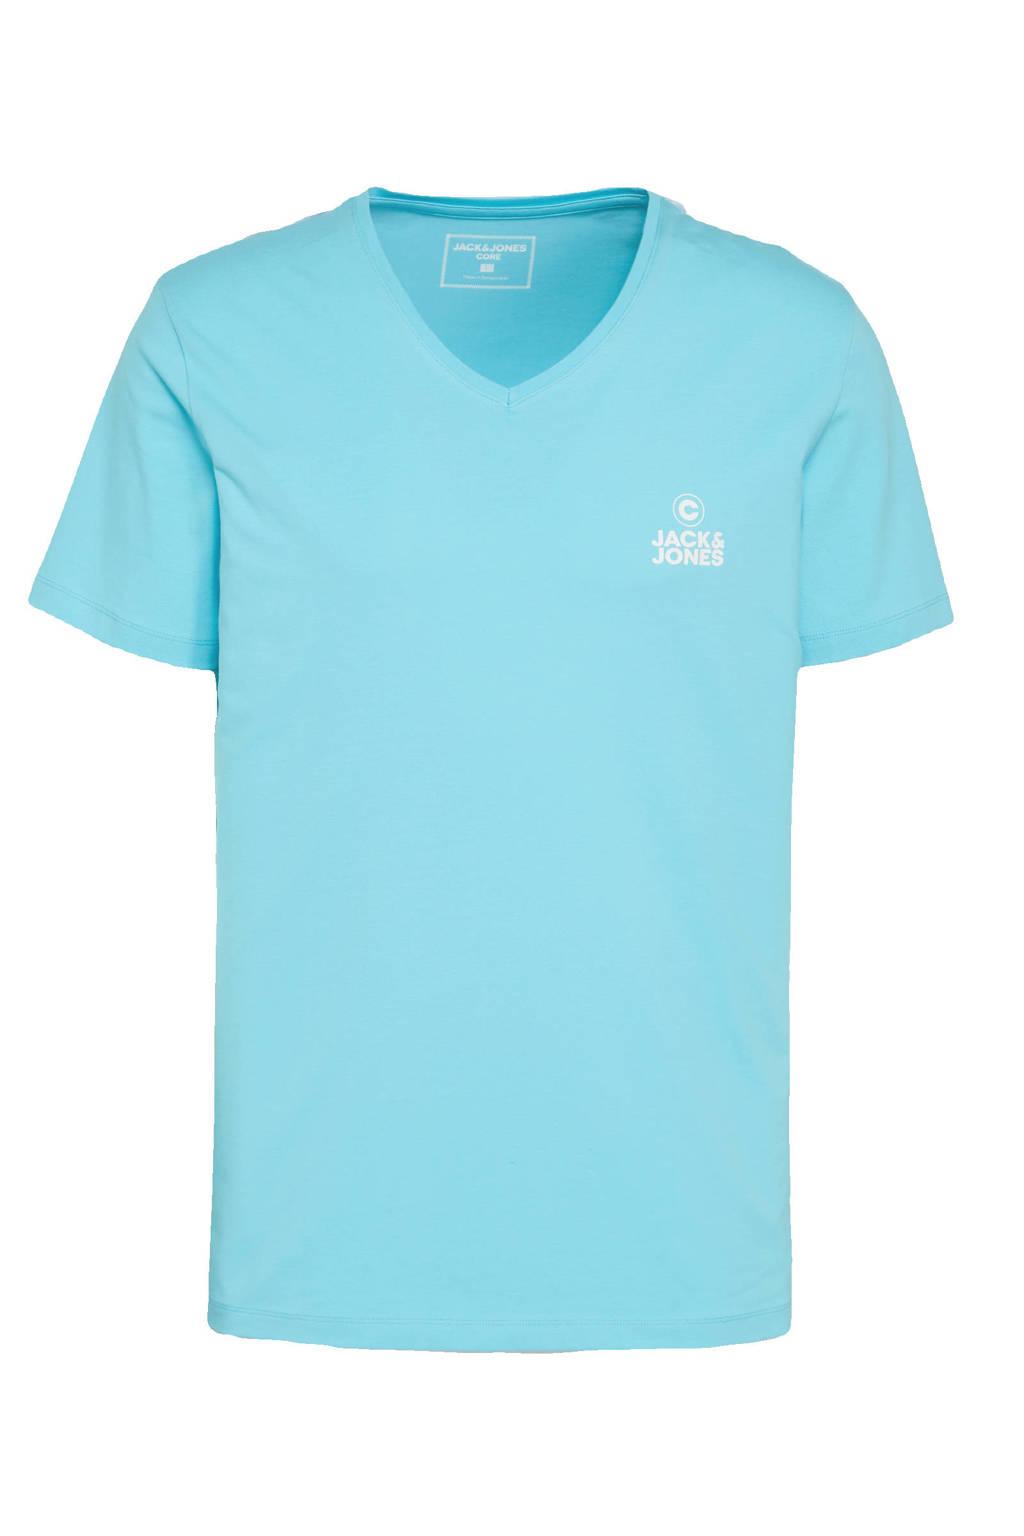 JACK & JONES CORE T-shirt Florian bachelor button, Bachelor Button